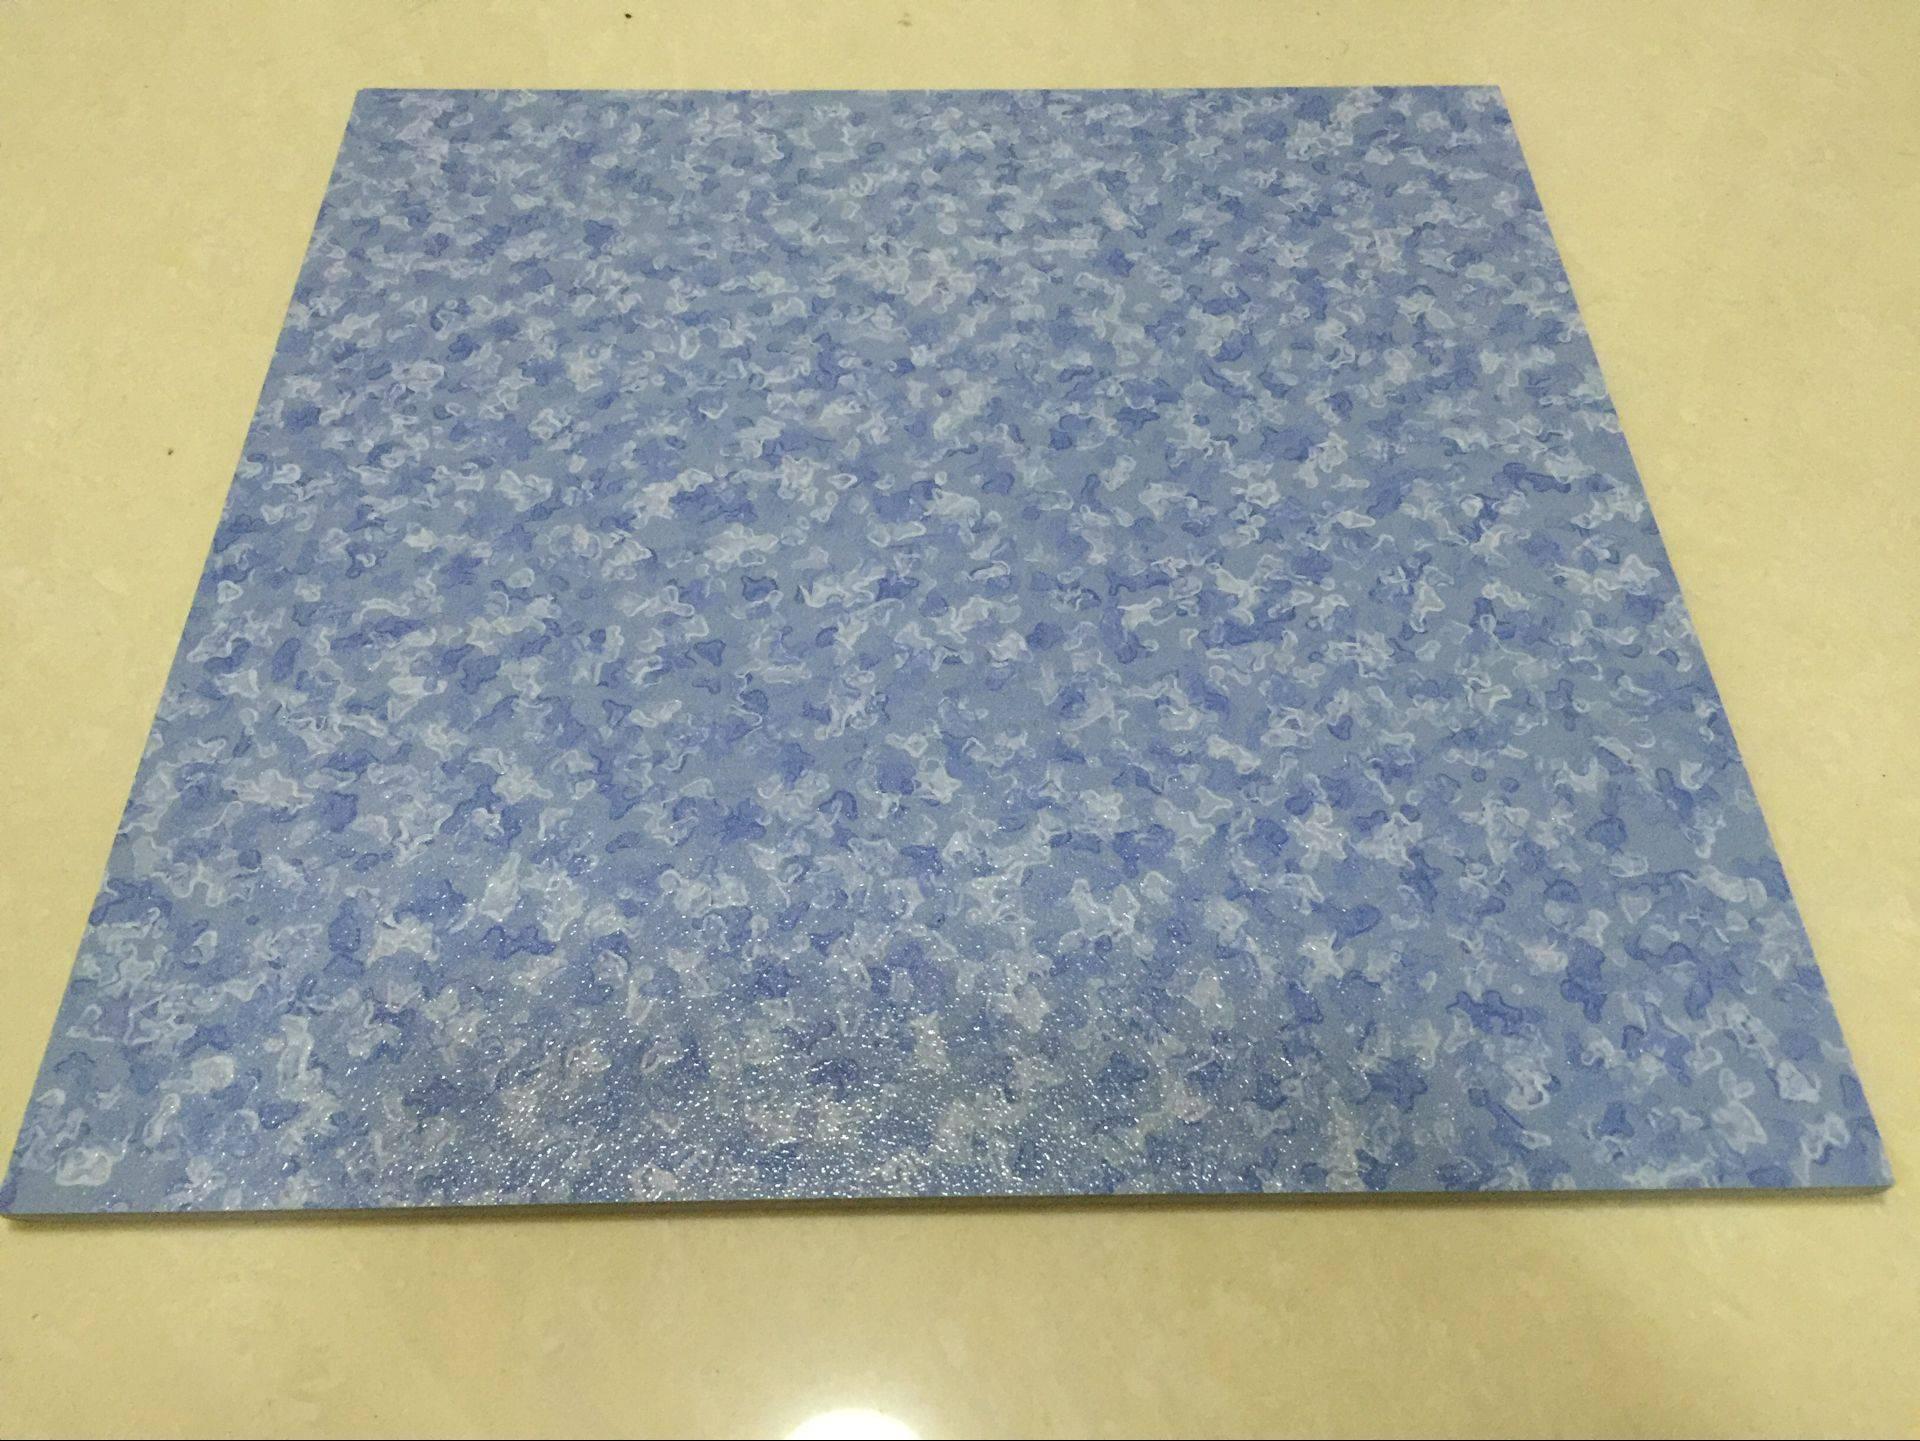 Flexible Rubber Flooring